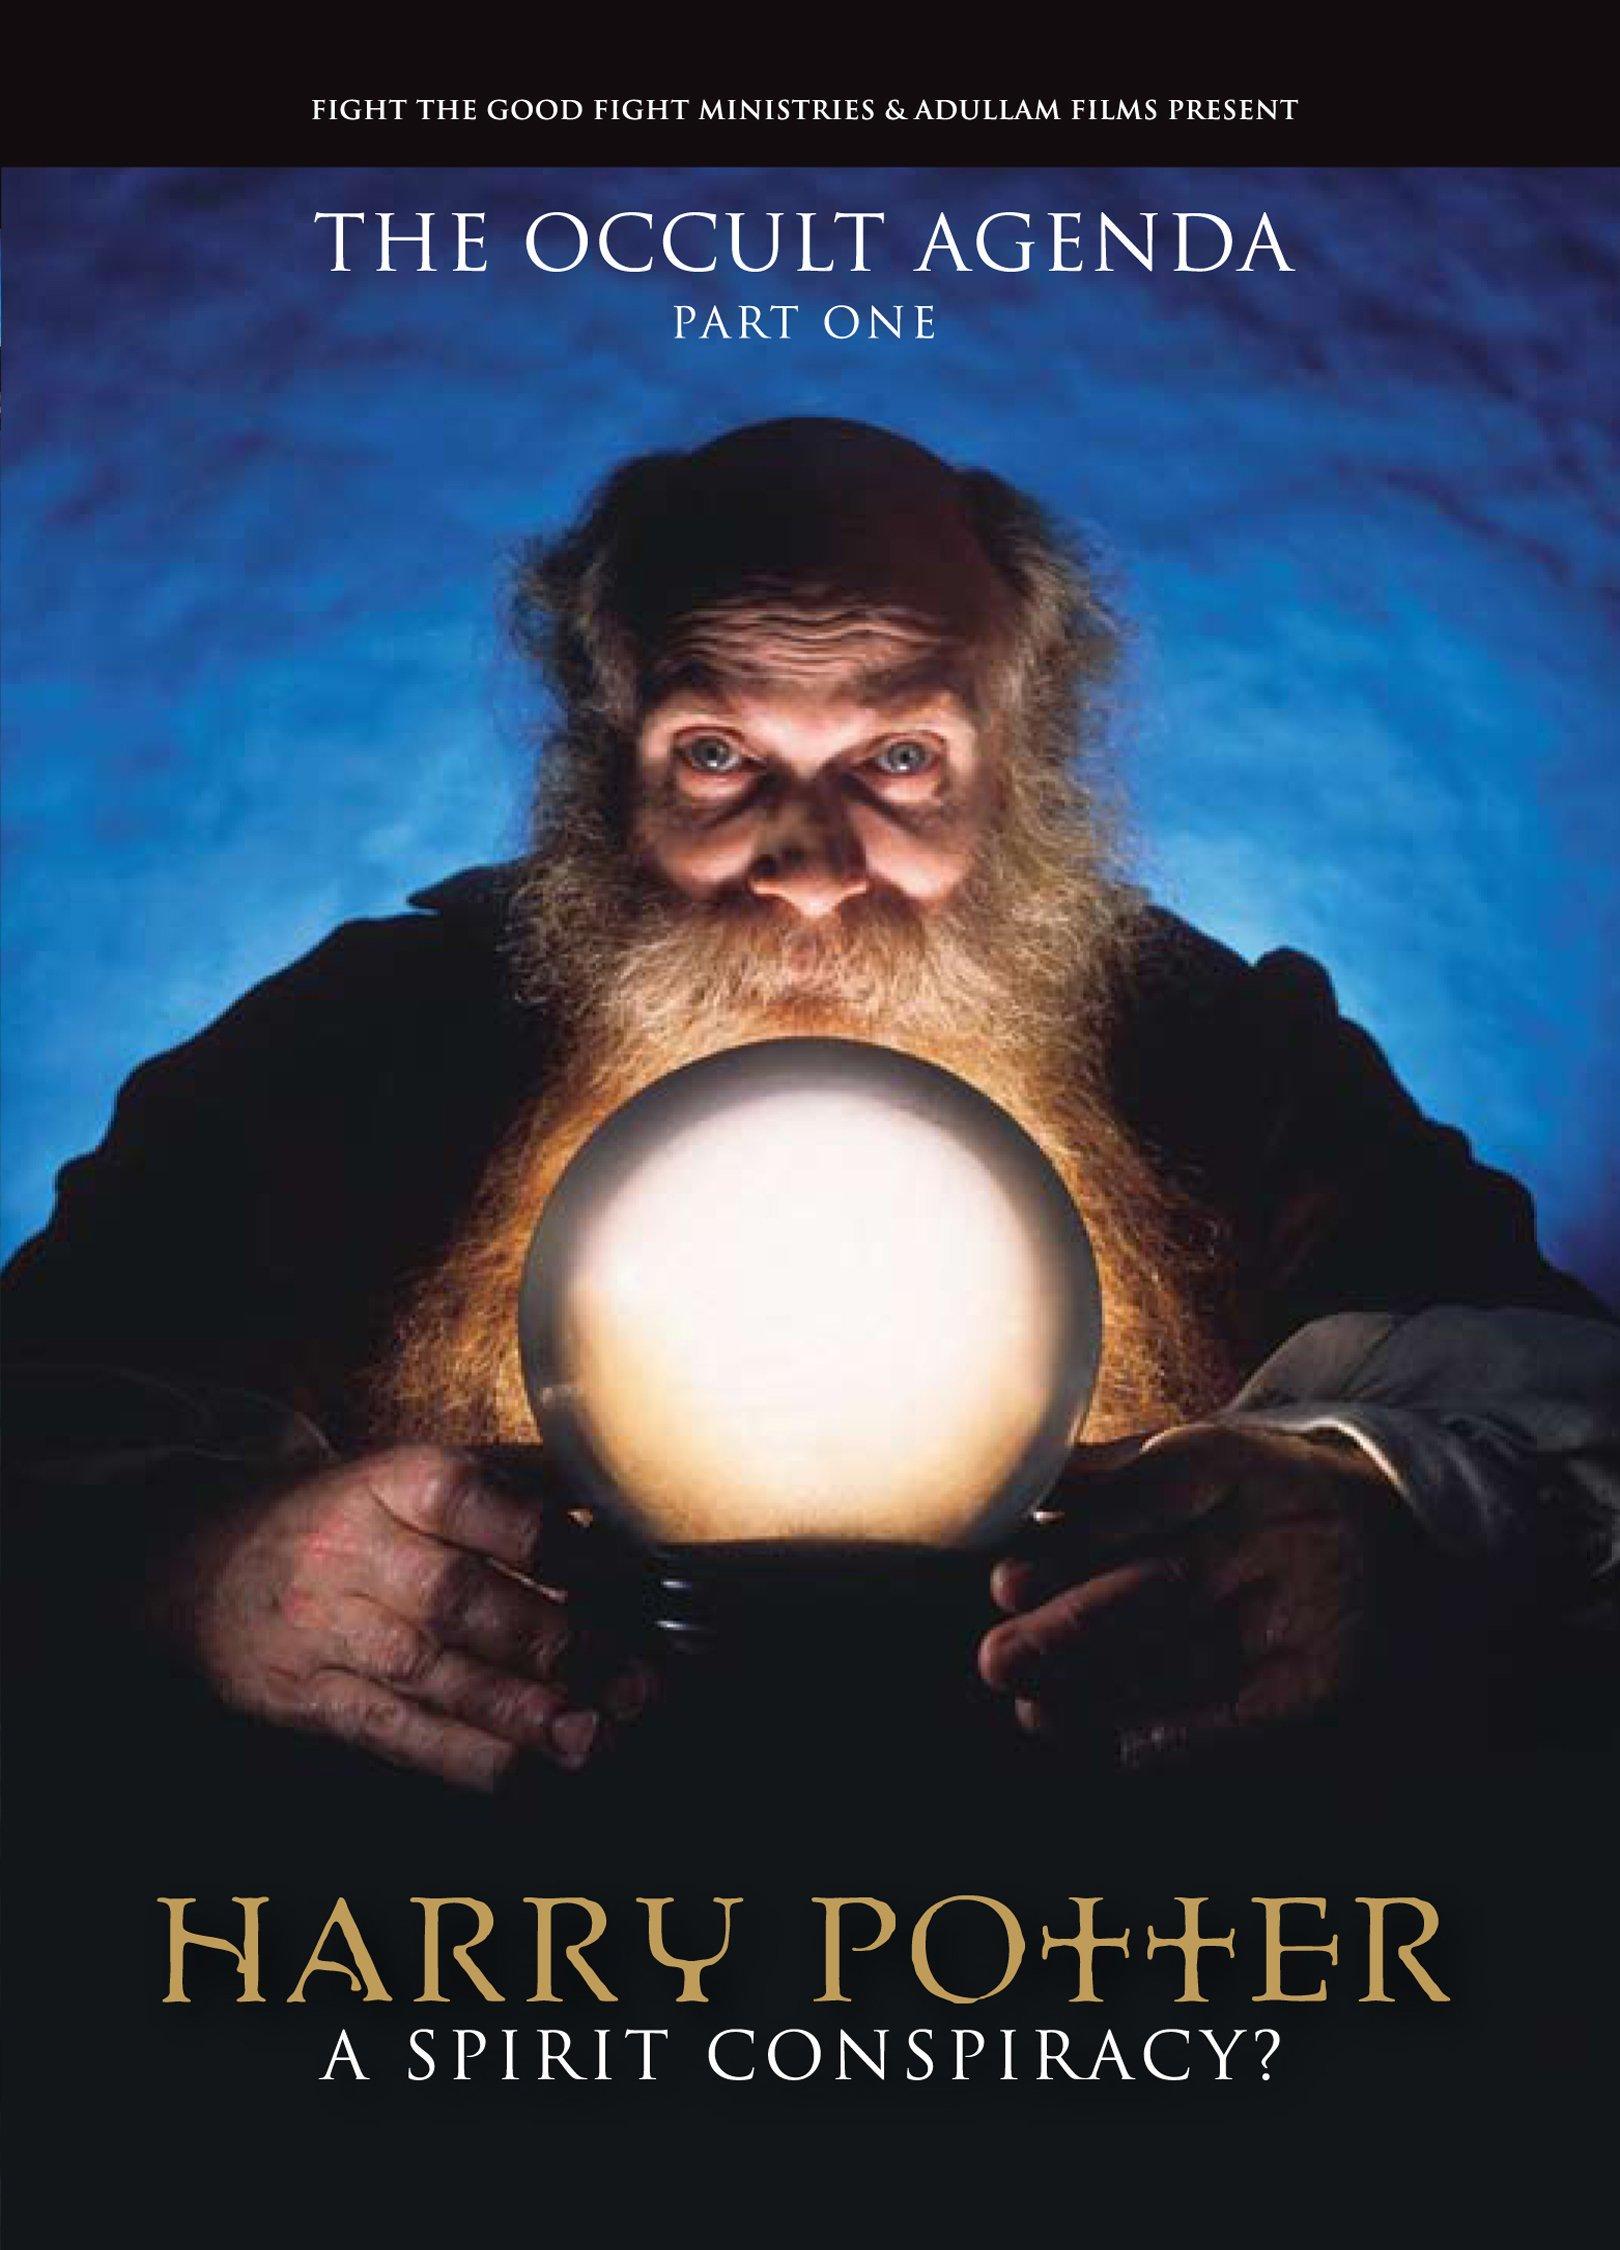 Amazon.com: Watch Harry Potter: A Spirit Conspiracy? | Prime ...